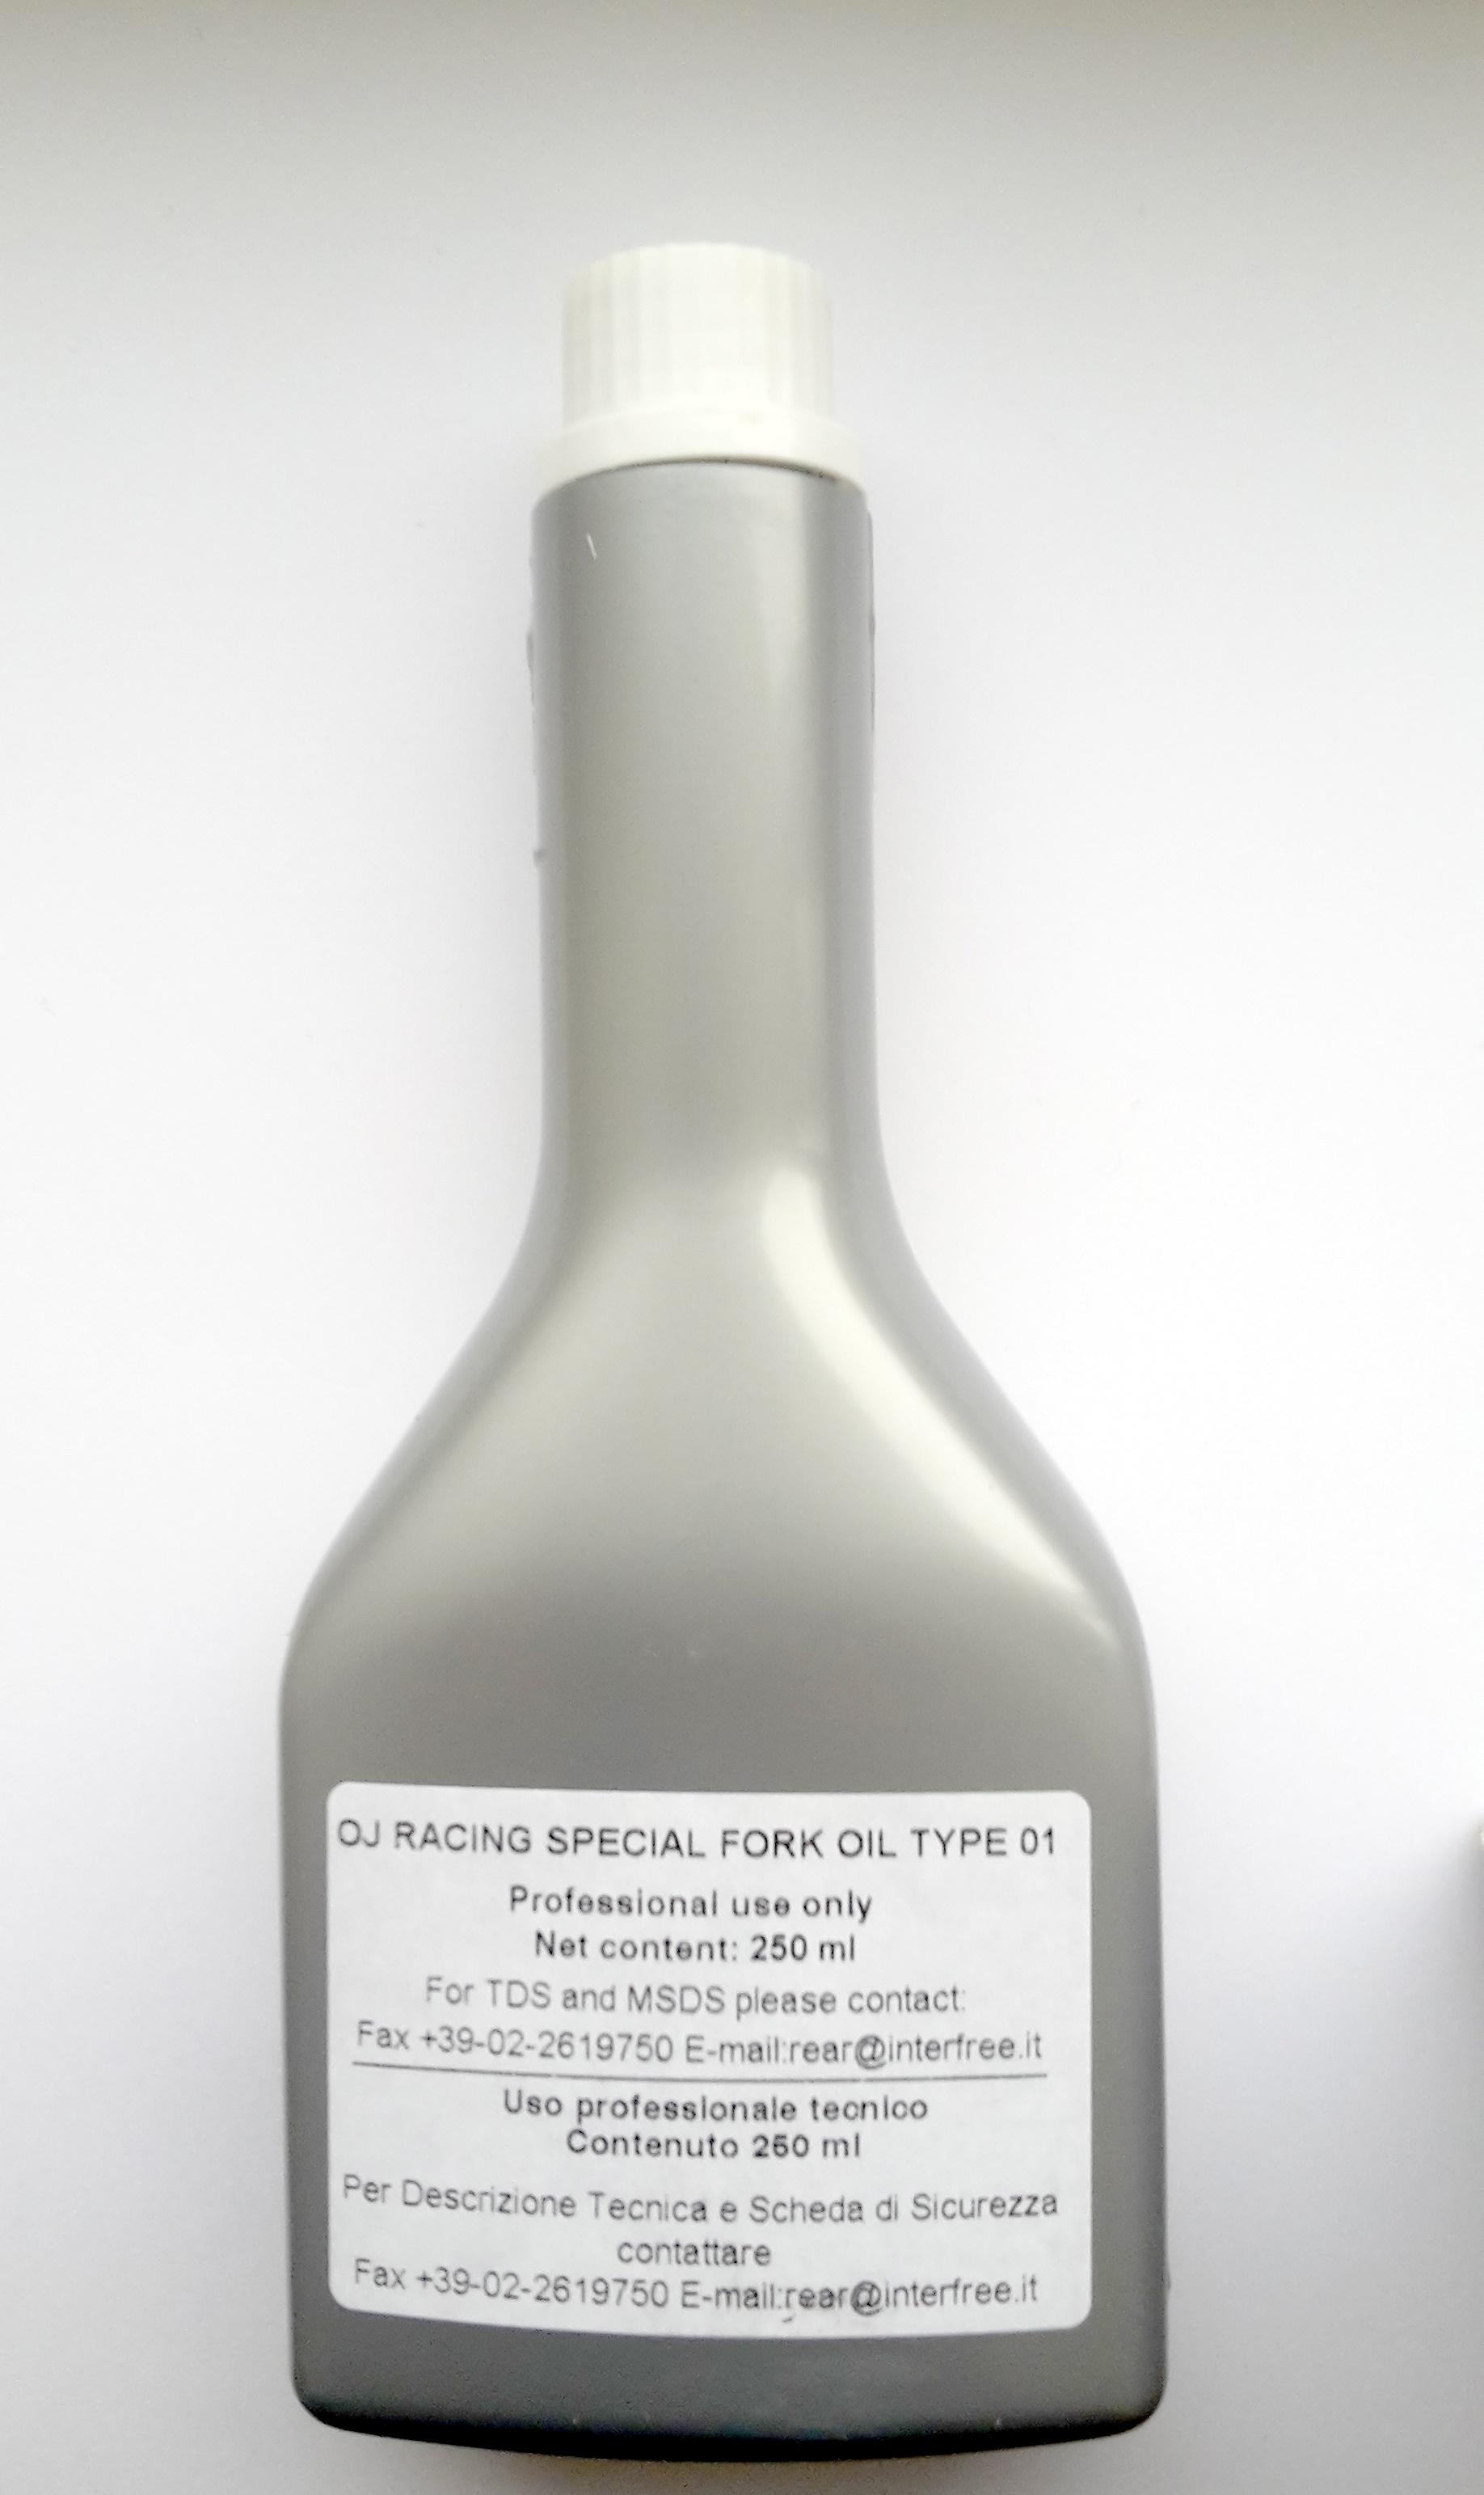 Fork Oil  - olej 'OJ' pro patrony vidlic FORMULA 250ml